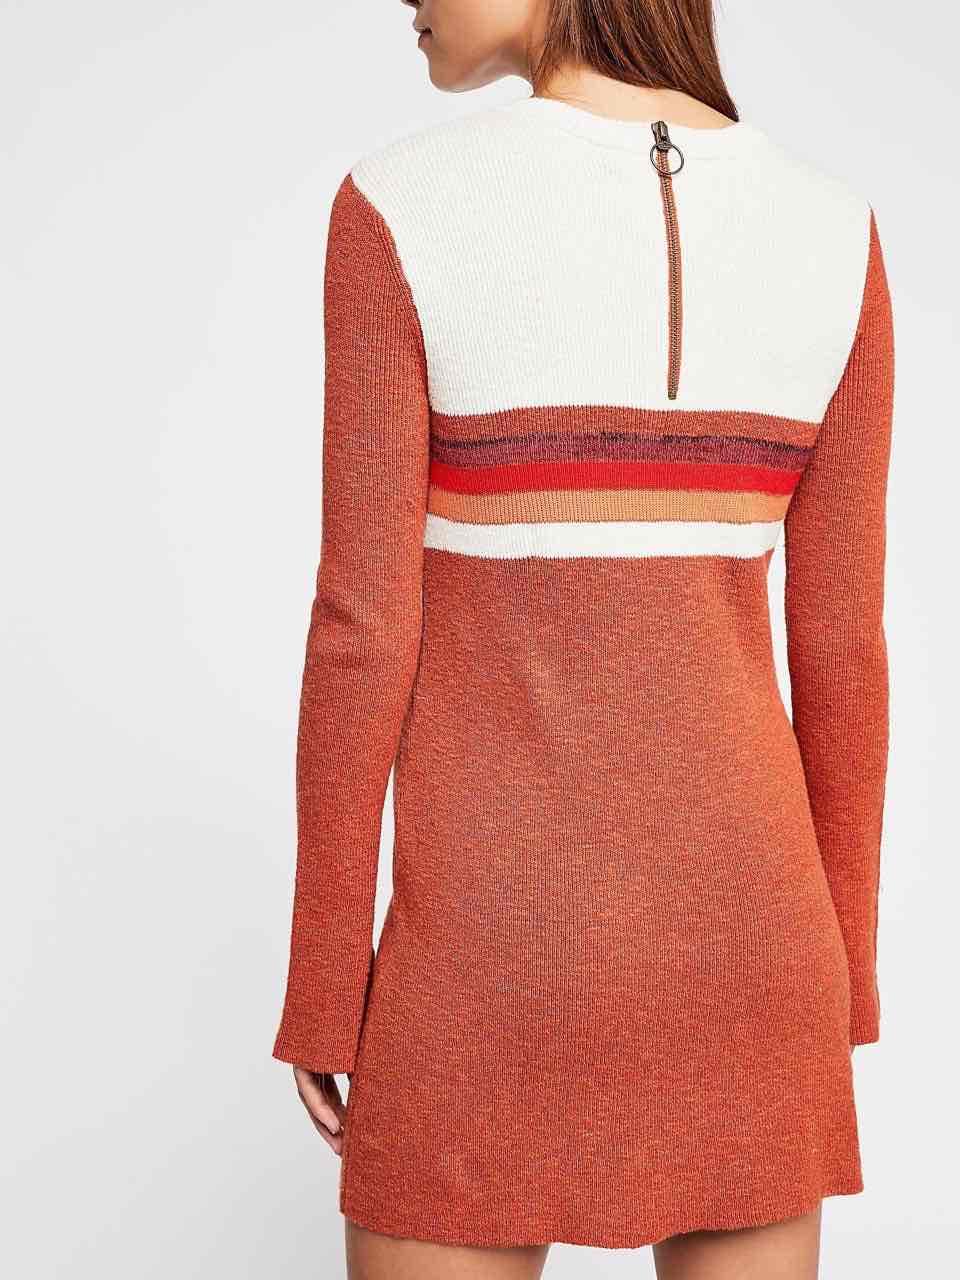 Free People Color Block Swit Sweater Mini Dress Rusty Red